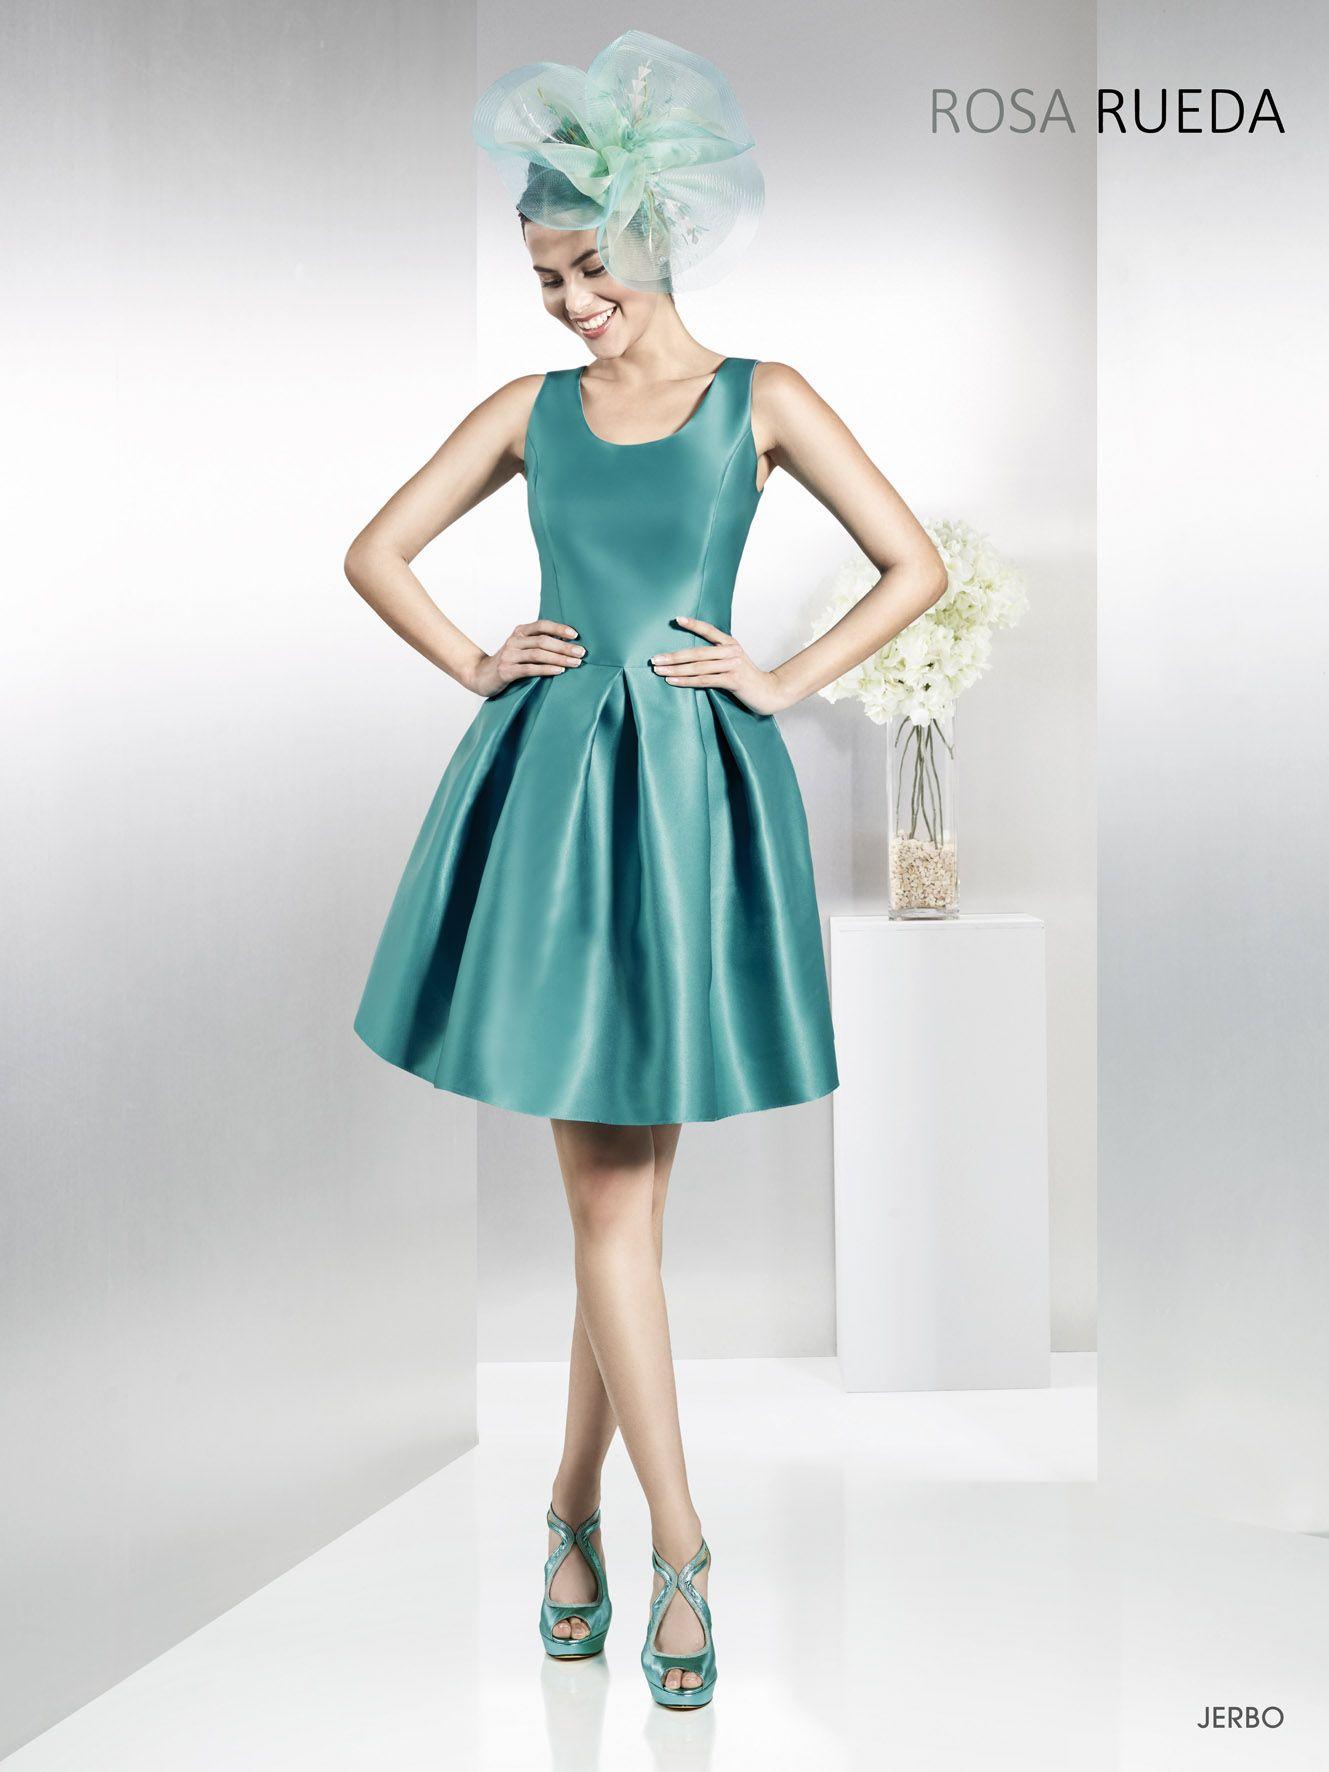 Vestido modelo 18215A de Ana Torres. Elegante vestido